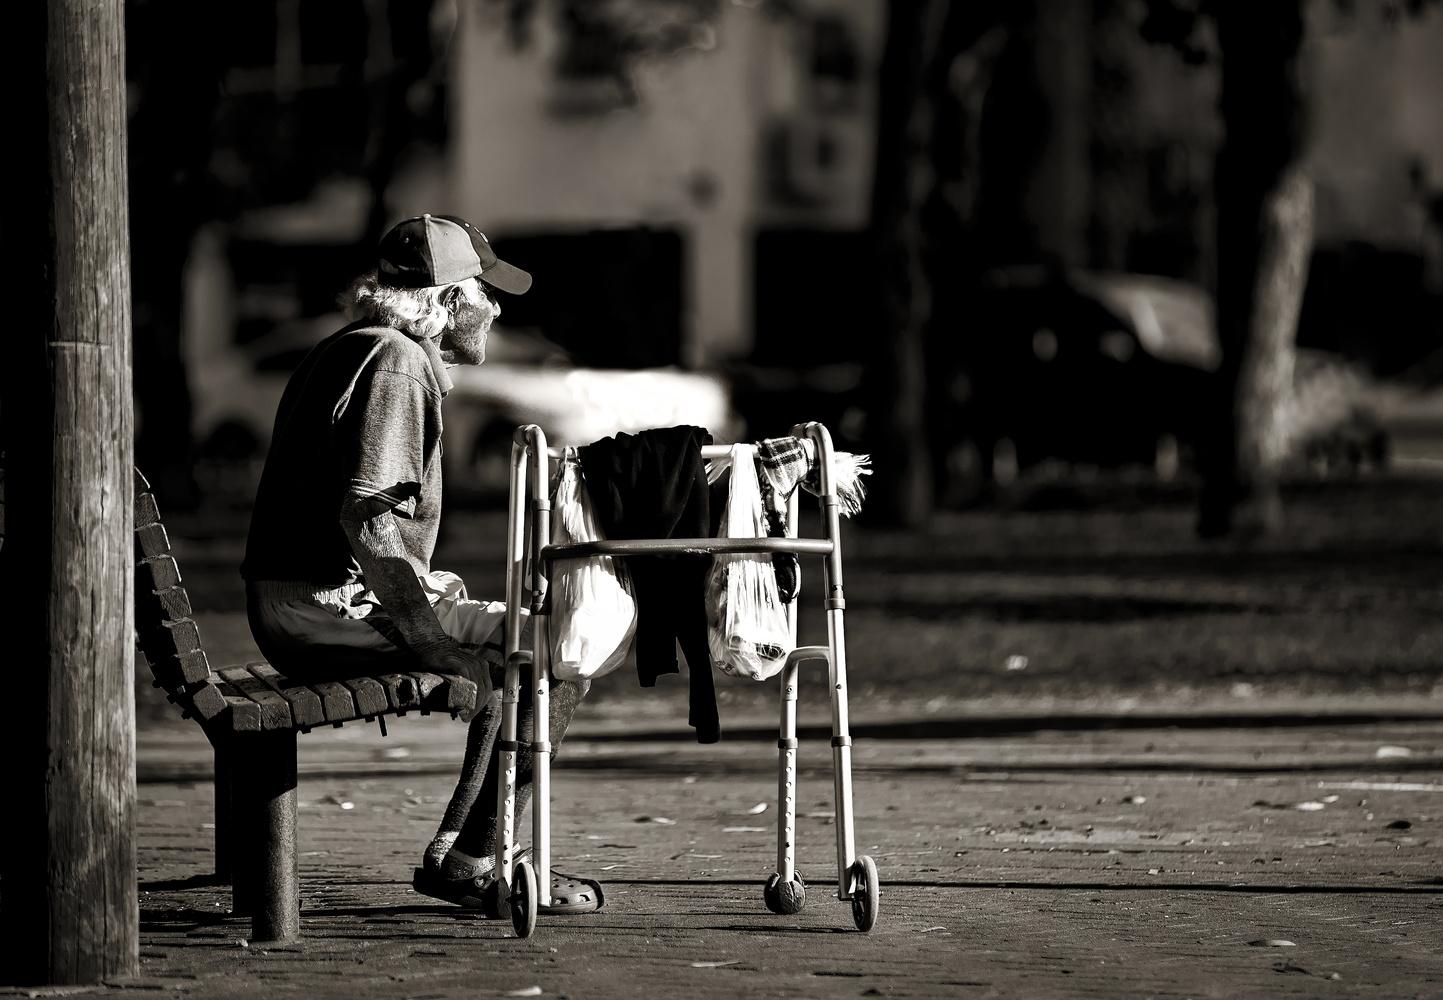 Sitting on a bench. by Nir Roitman